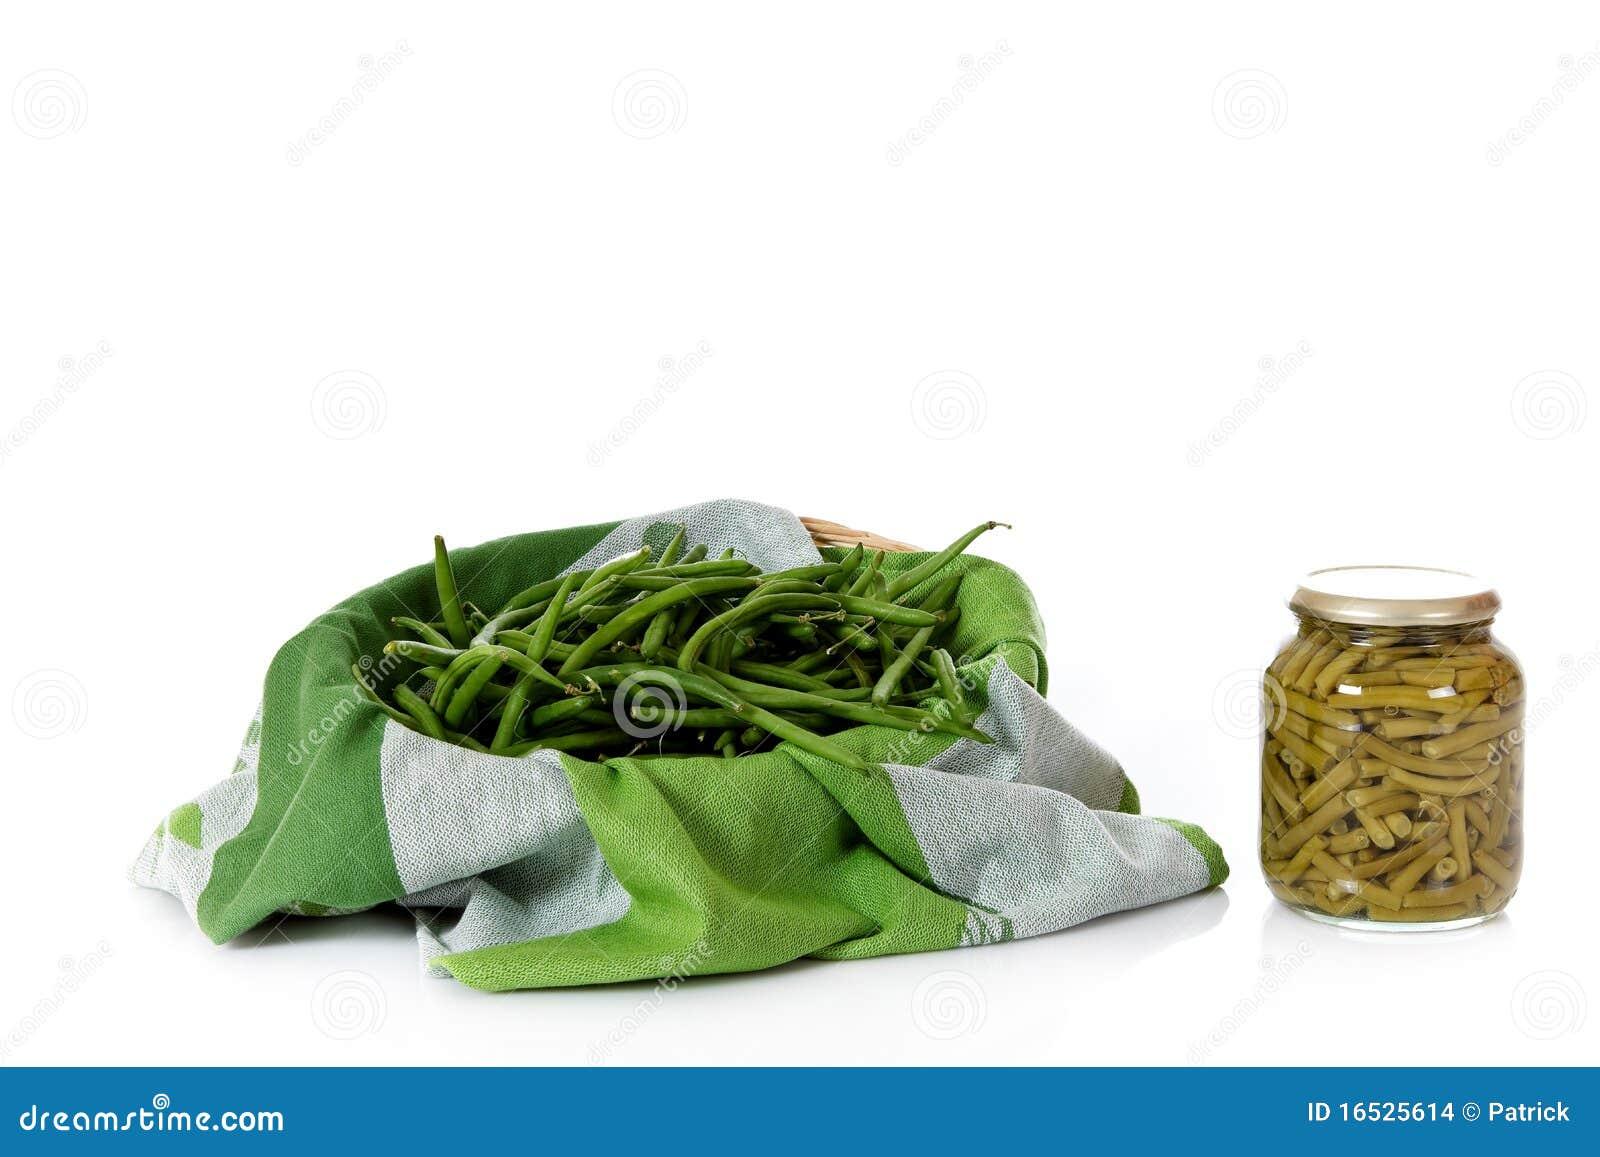 Fresco contro i fagioli verdi inscatolati